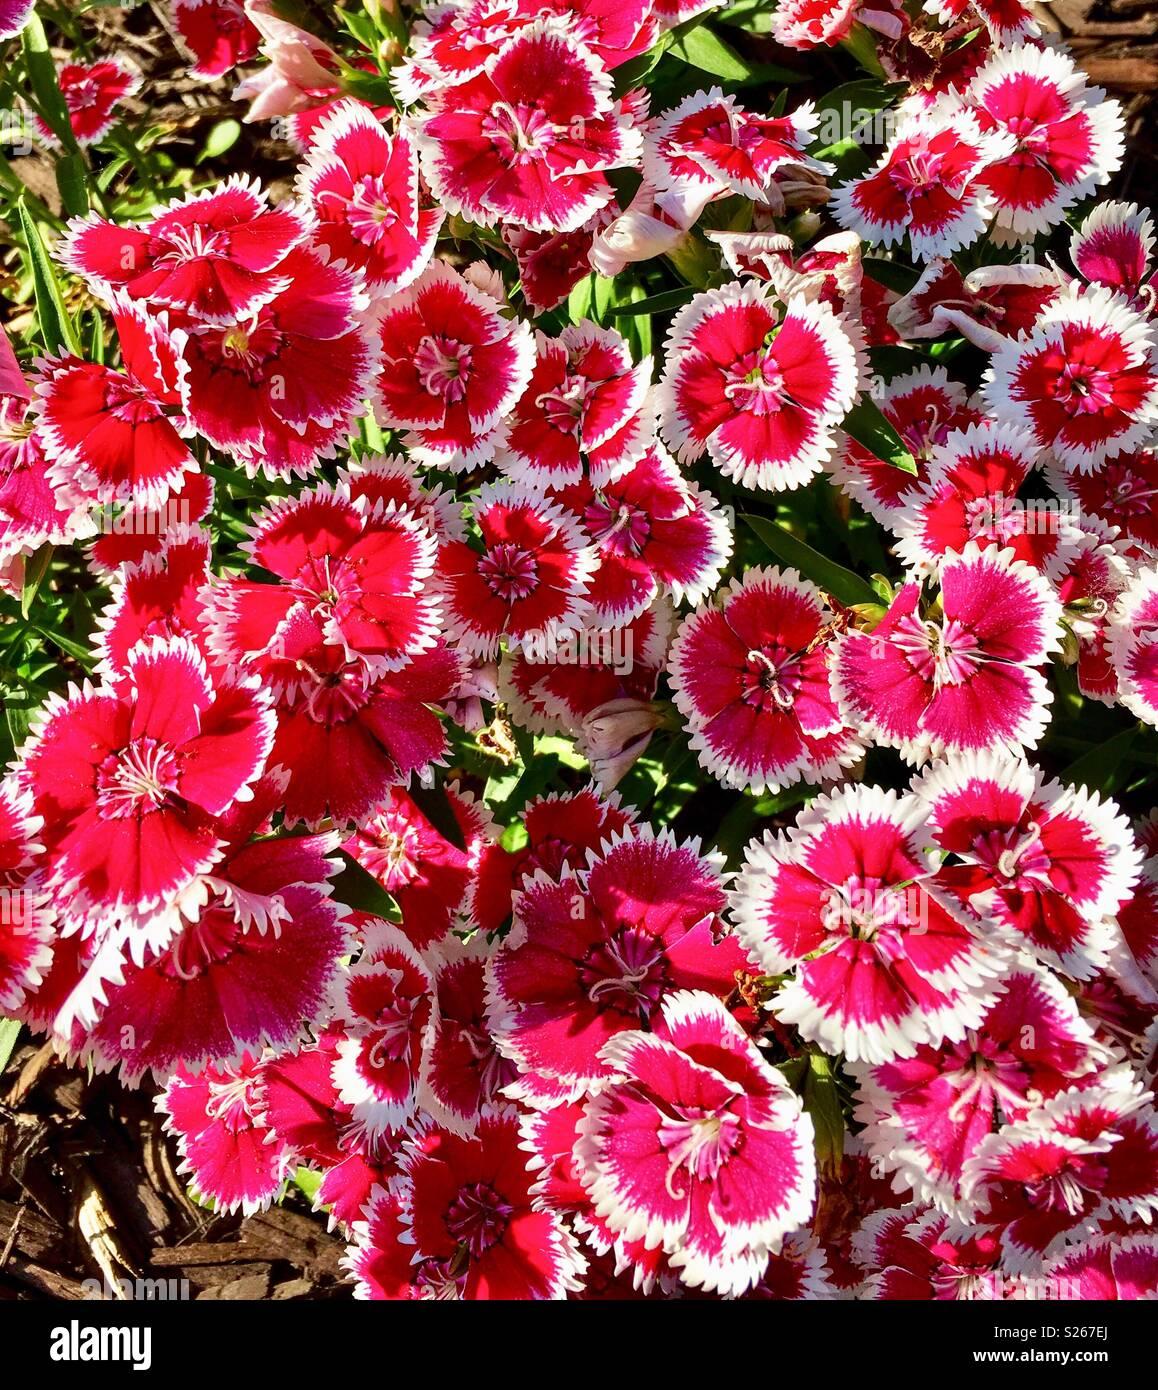 White flowers pinks dianthus stock photos white flowers pinks dianthus pinks flowers stock image mightylinksfo